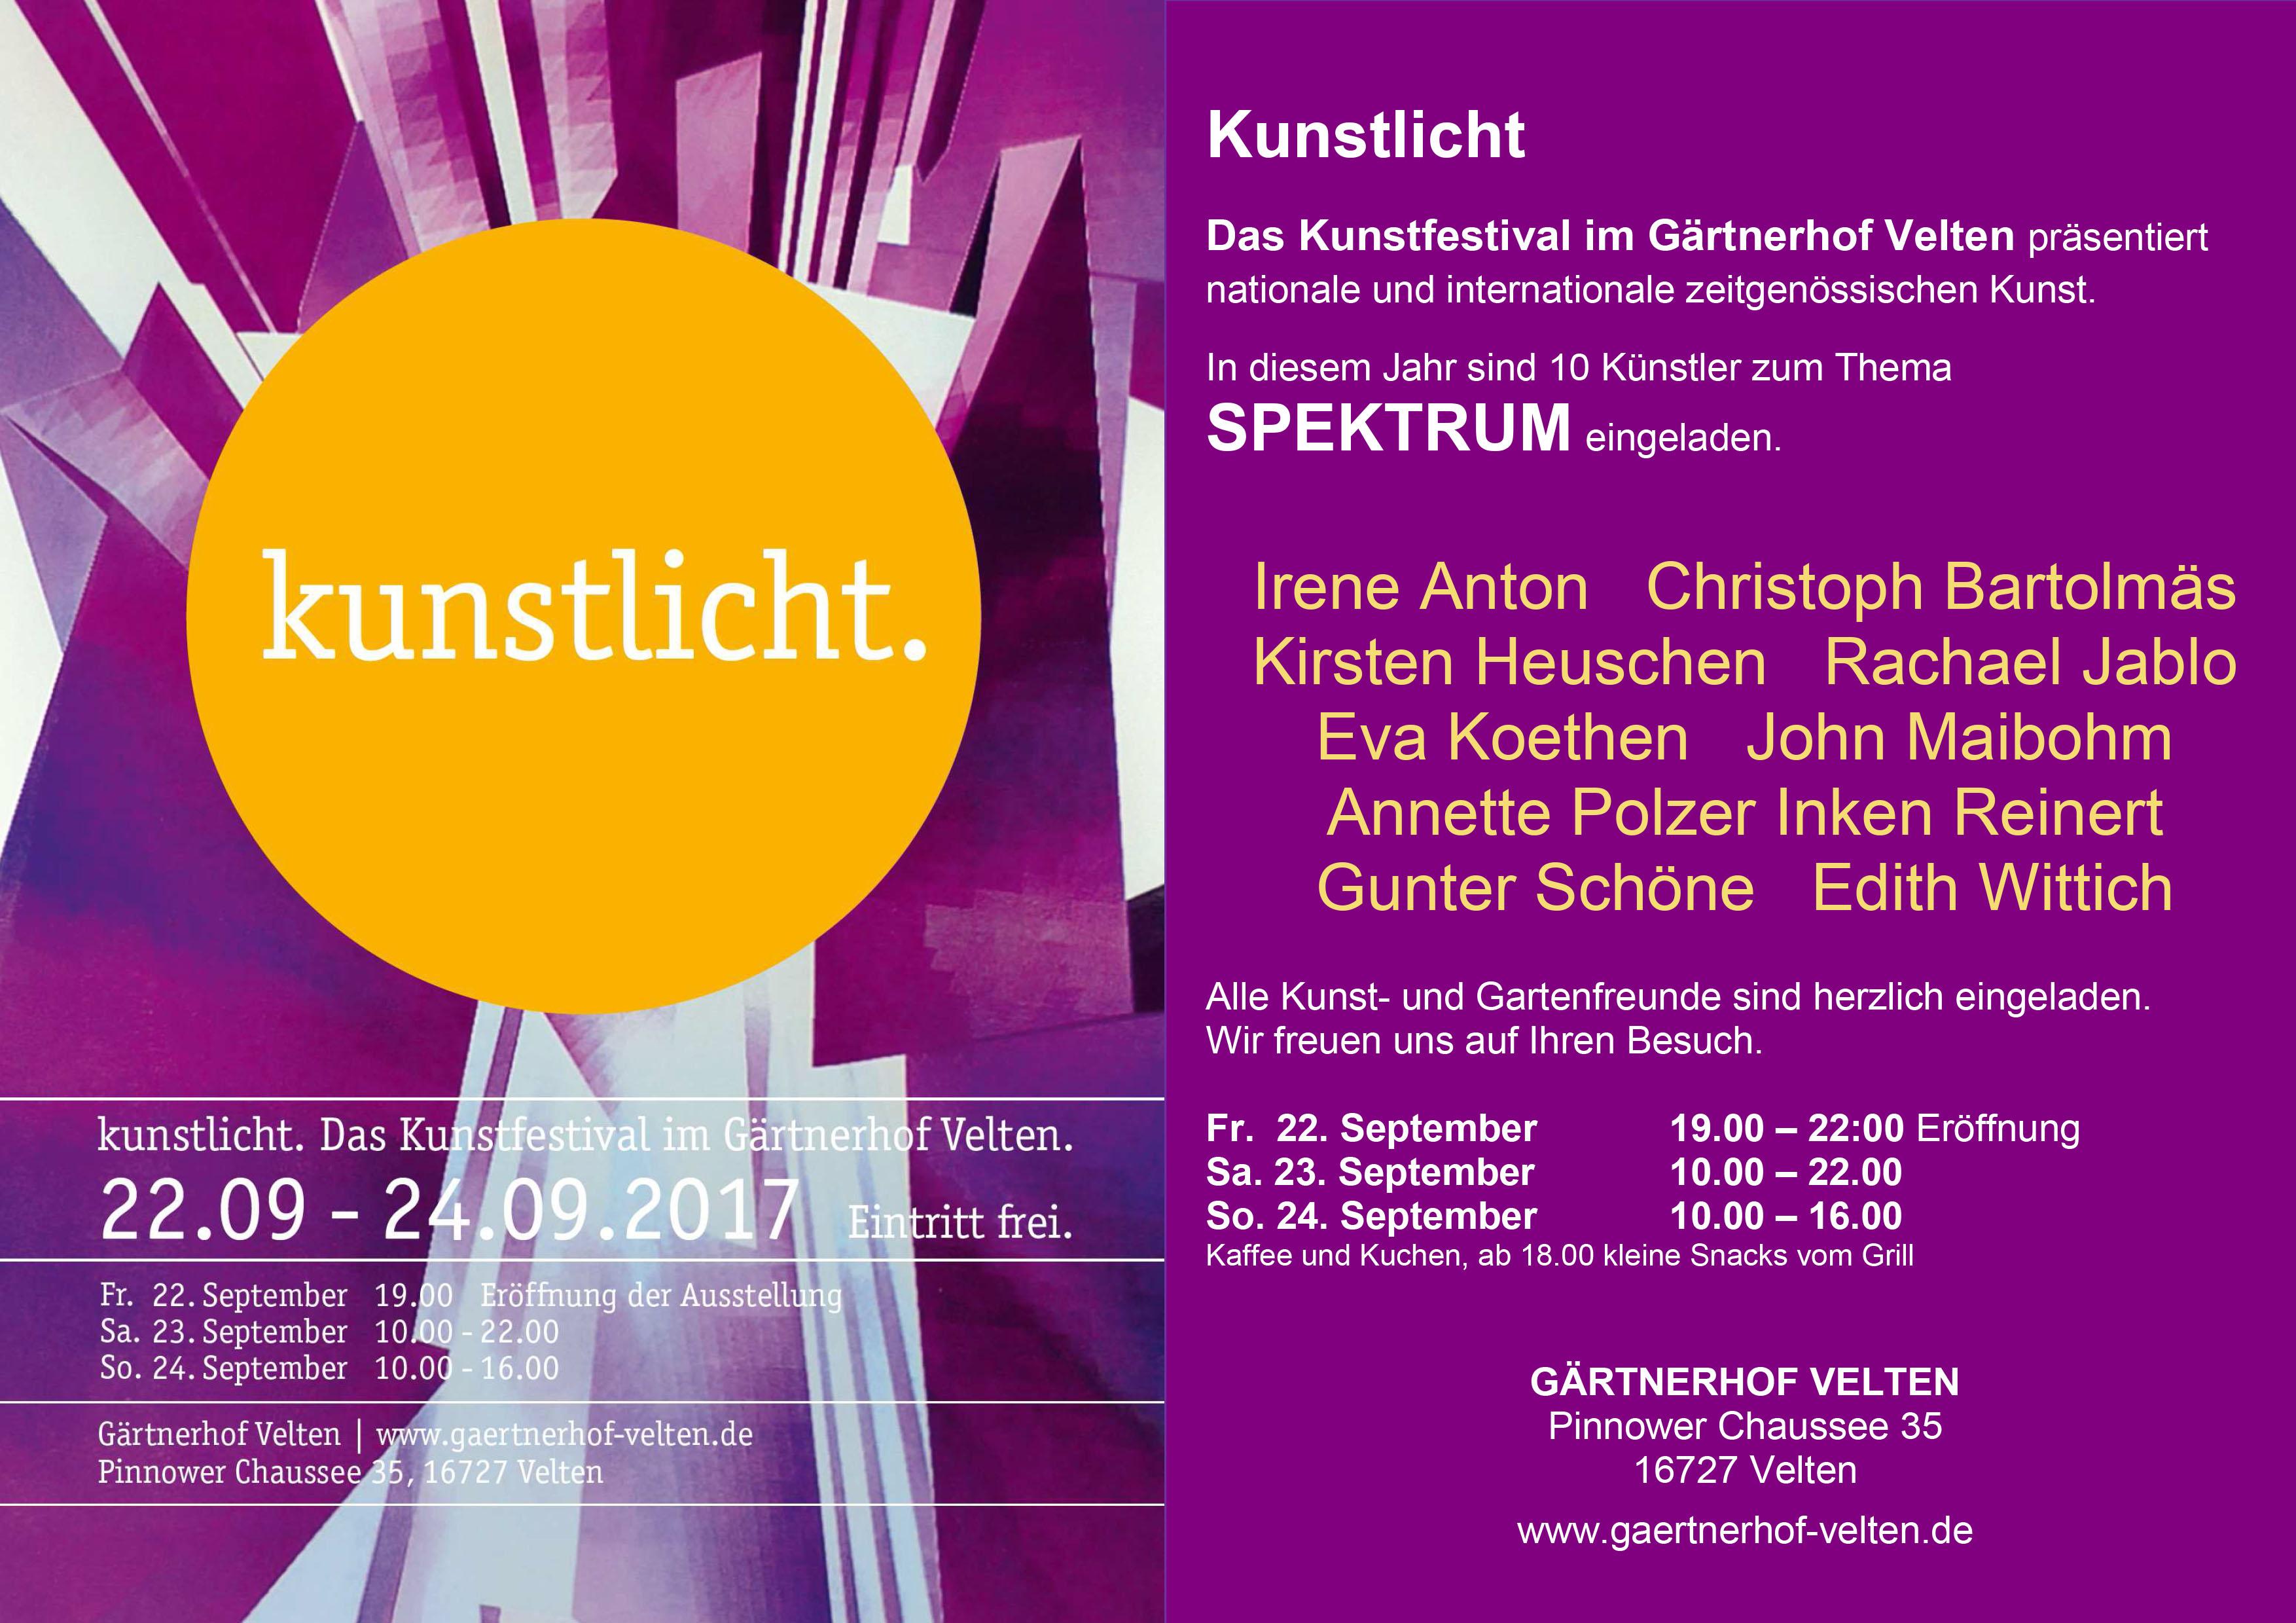 22. - 24.09. 2017 8. Kunstlicht-Festival, Velten